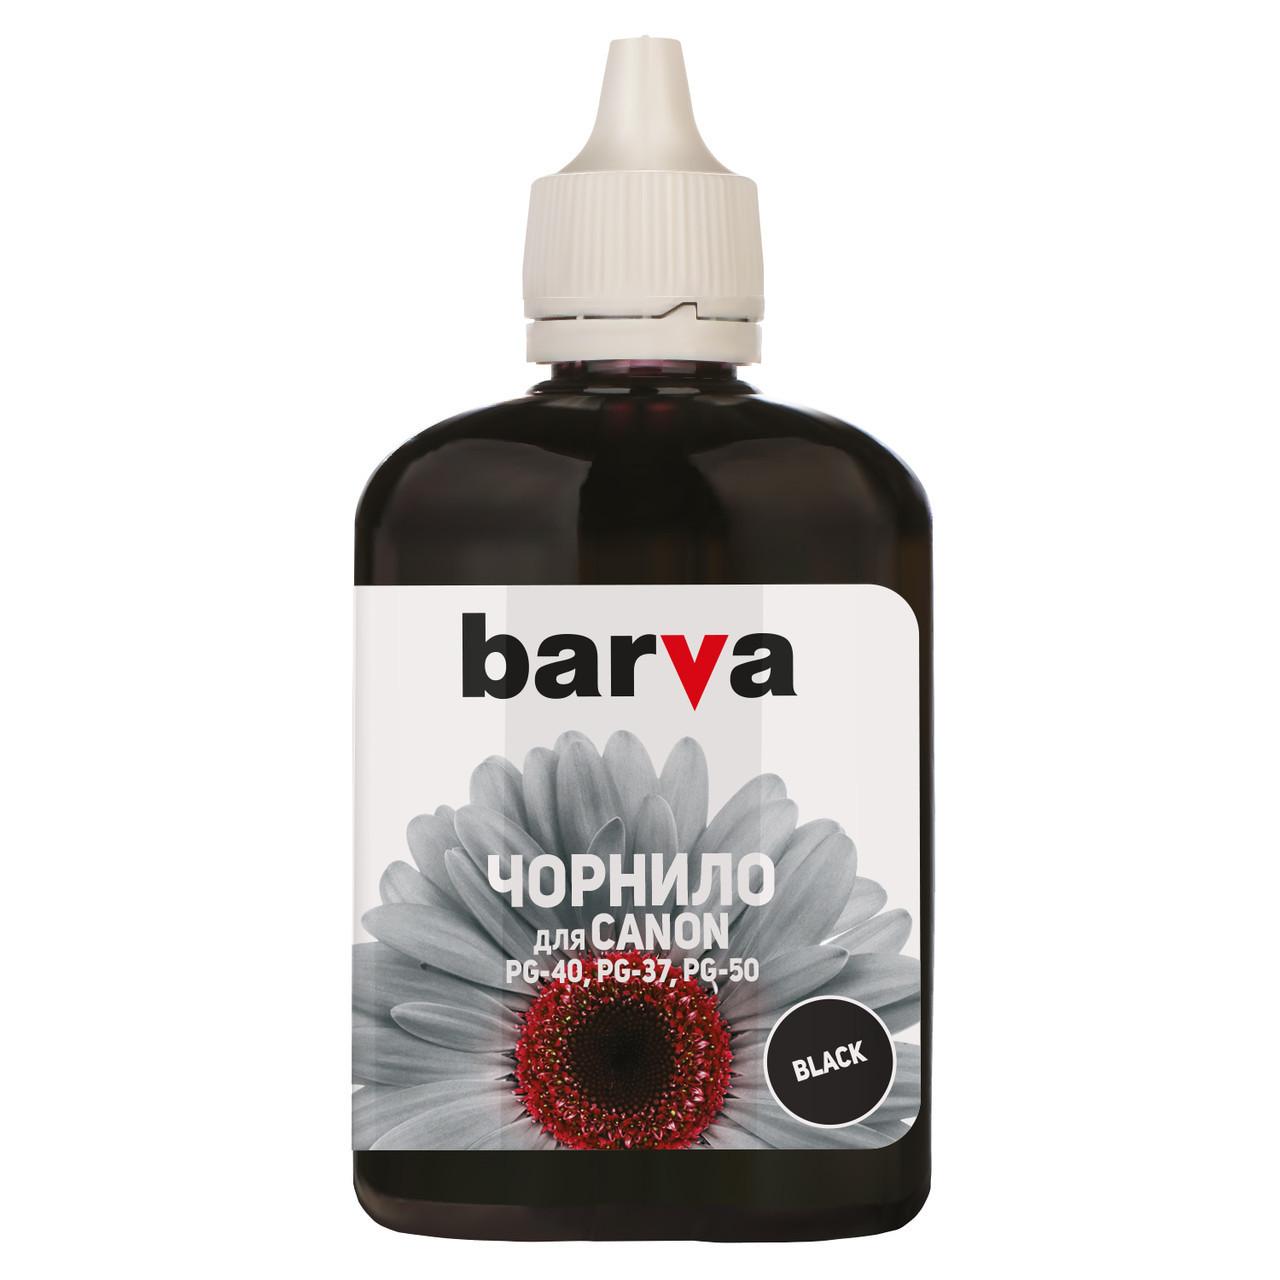 Чернила Barva Canon PG-37 / PG-40 / PG-50, Black, 90 г (C40-293), краска для принтера